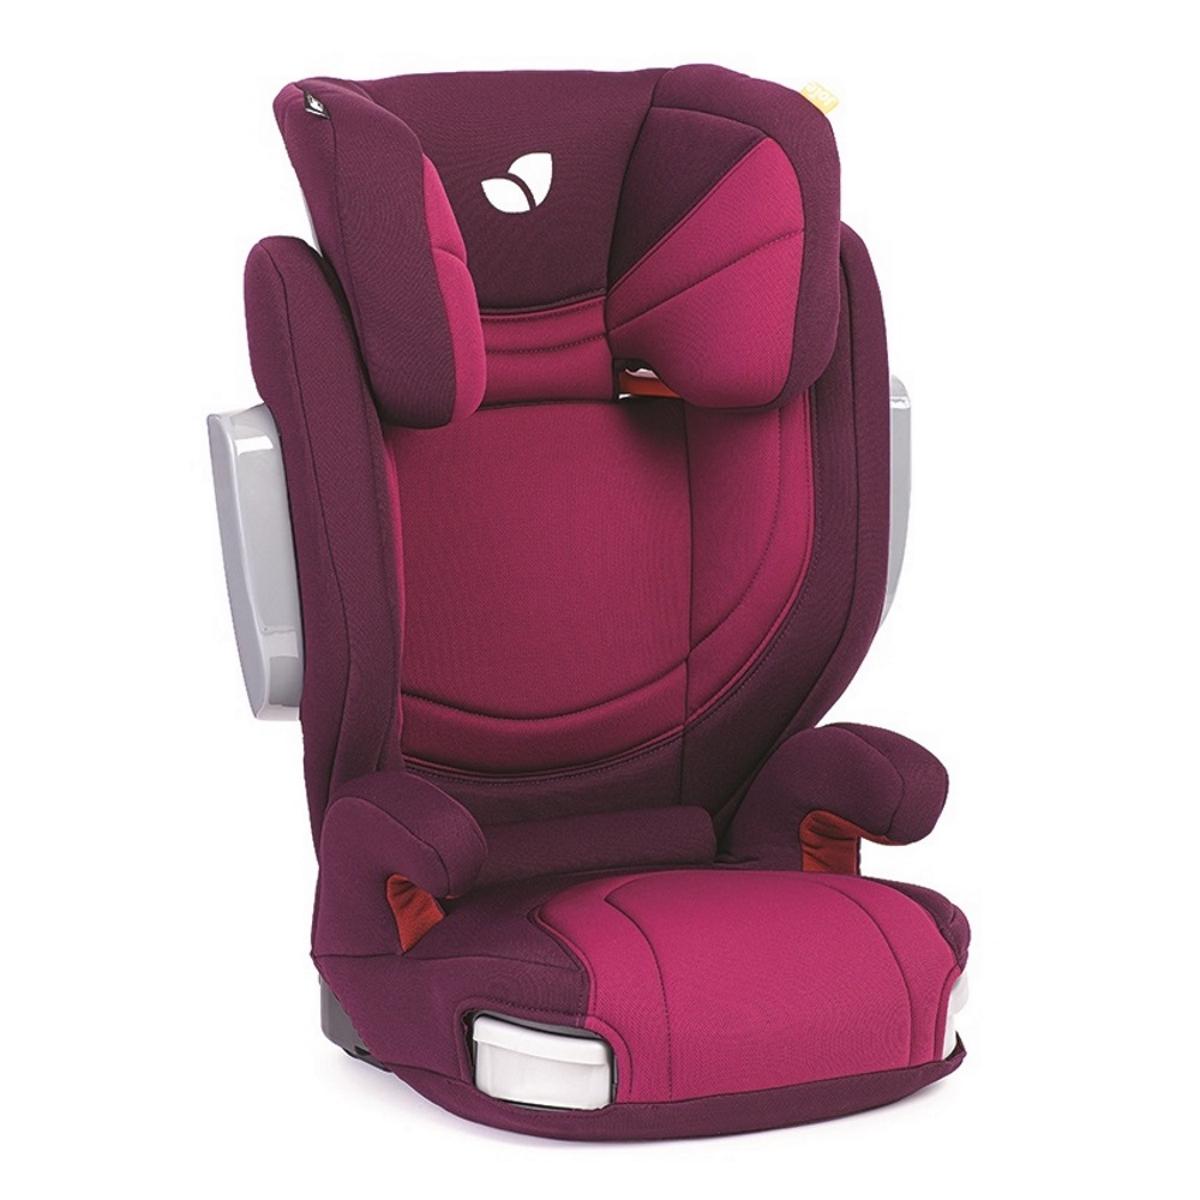 Cadeira auto Joie Trillo LX Car Seat